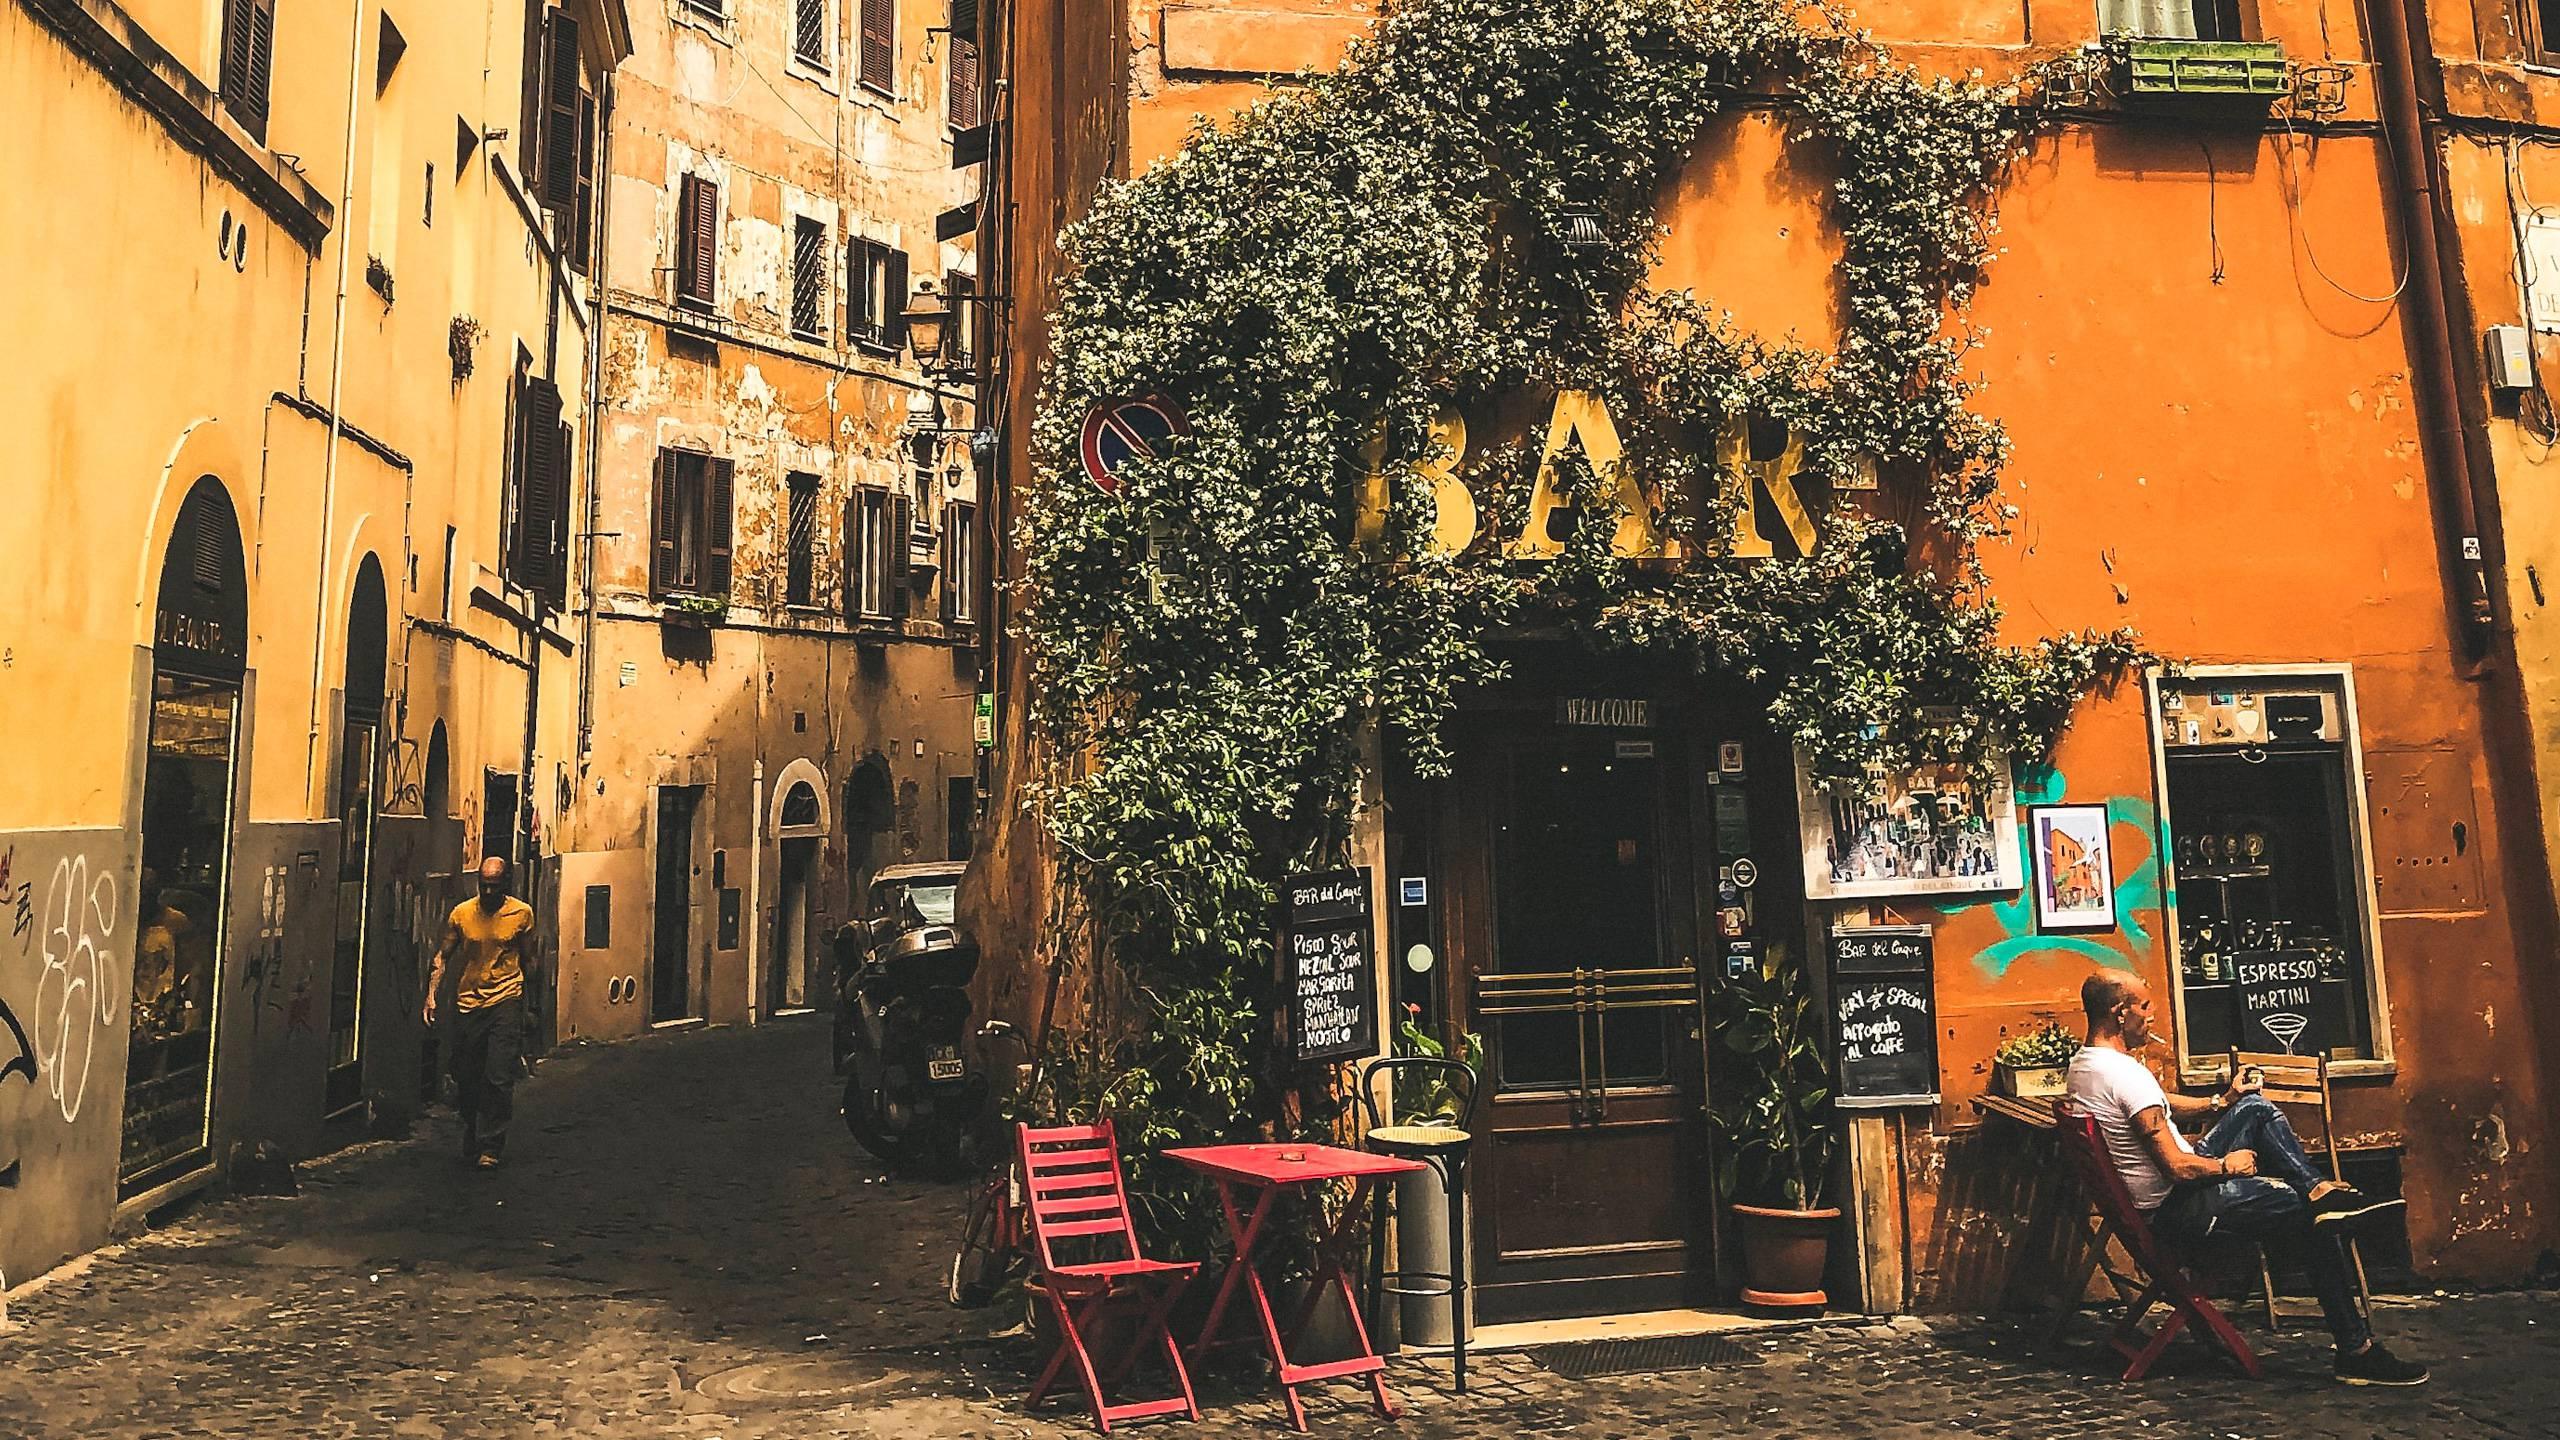 Hotel-Trastevere-Roma-Via-Romana